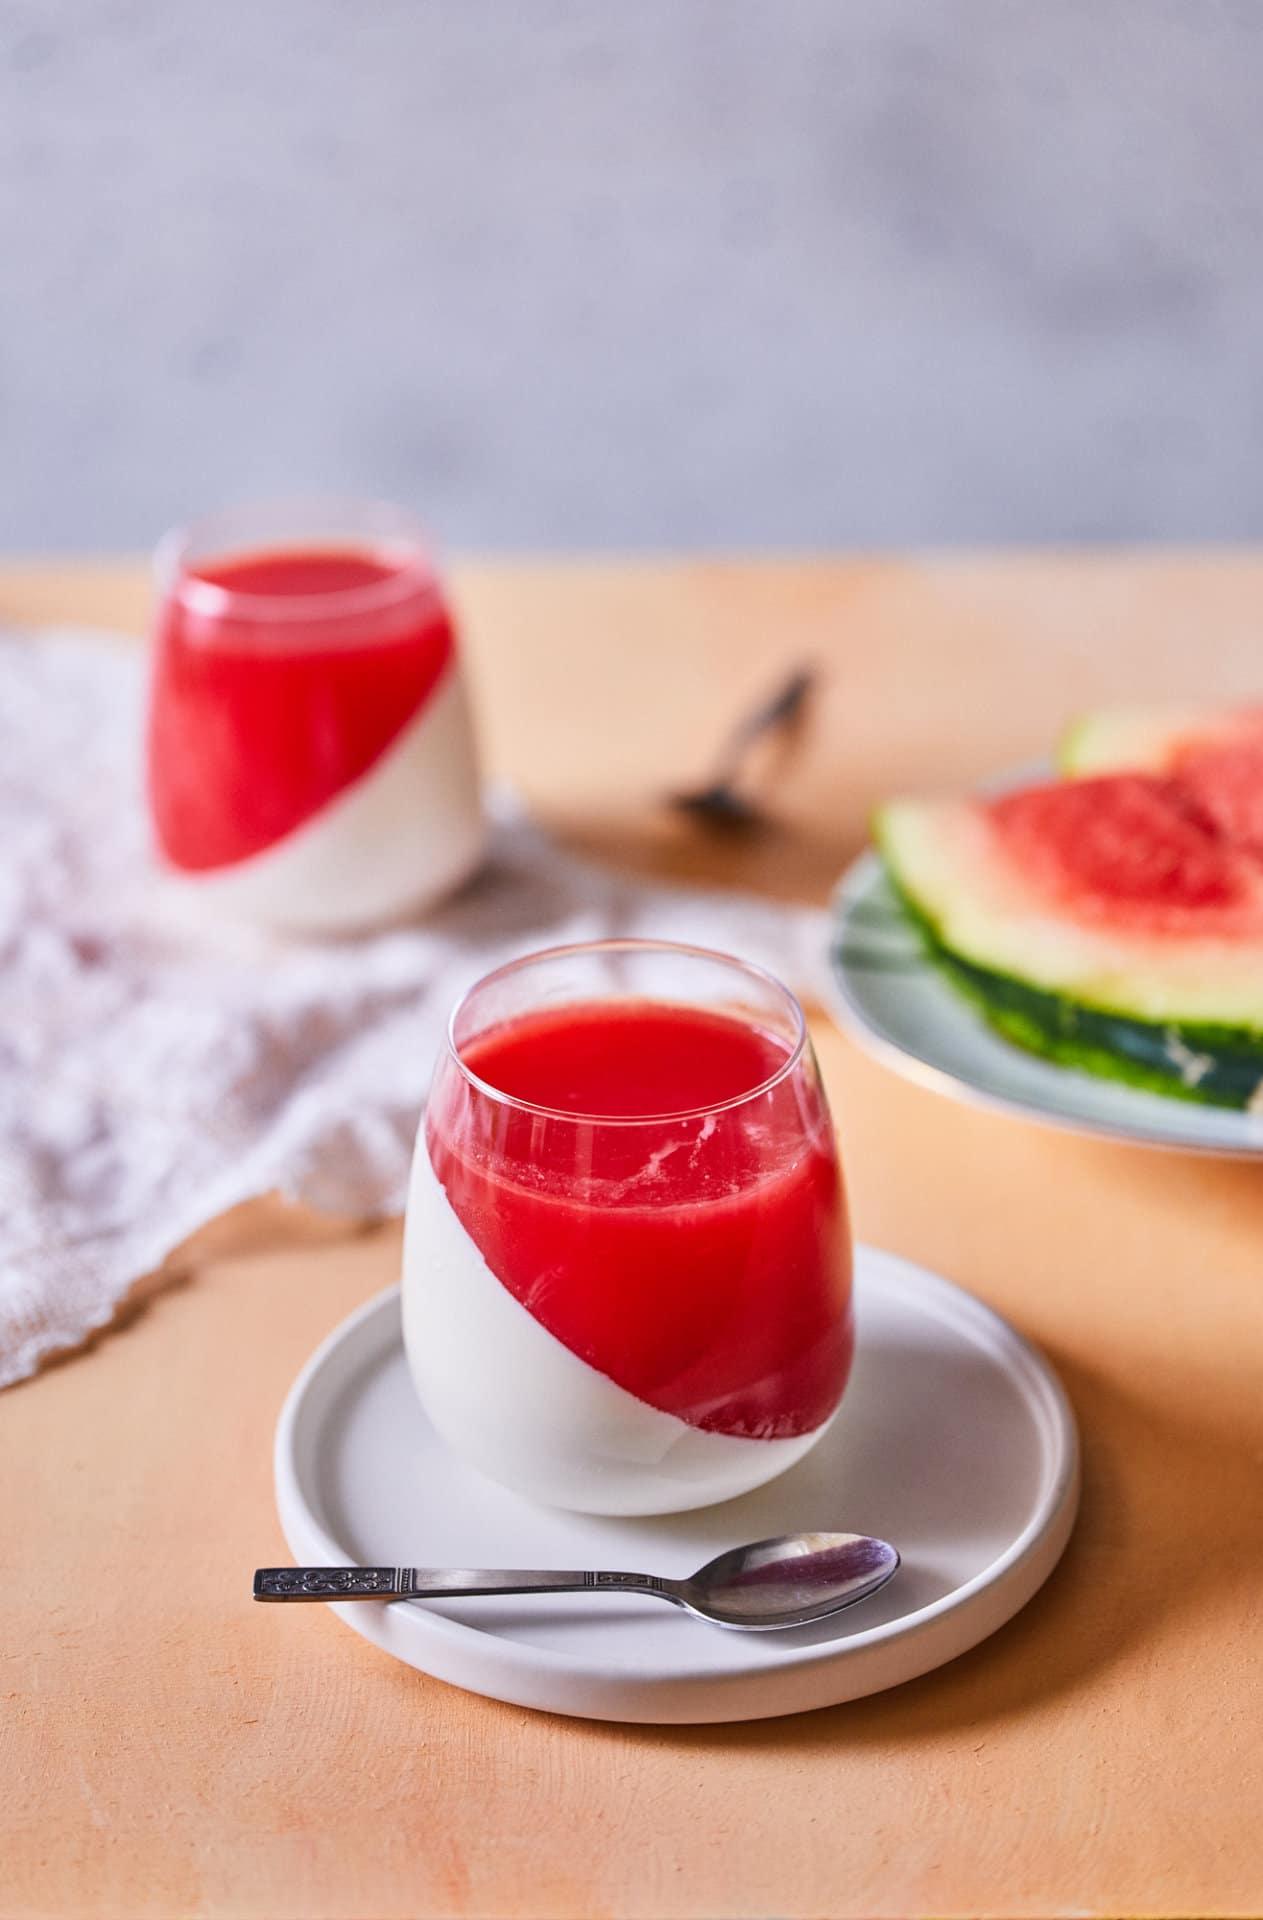 görögdinnyés panna cotta